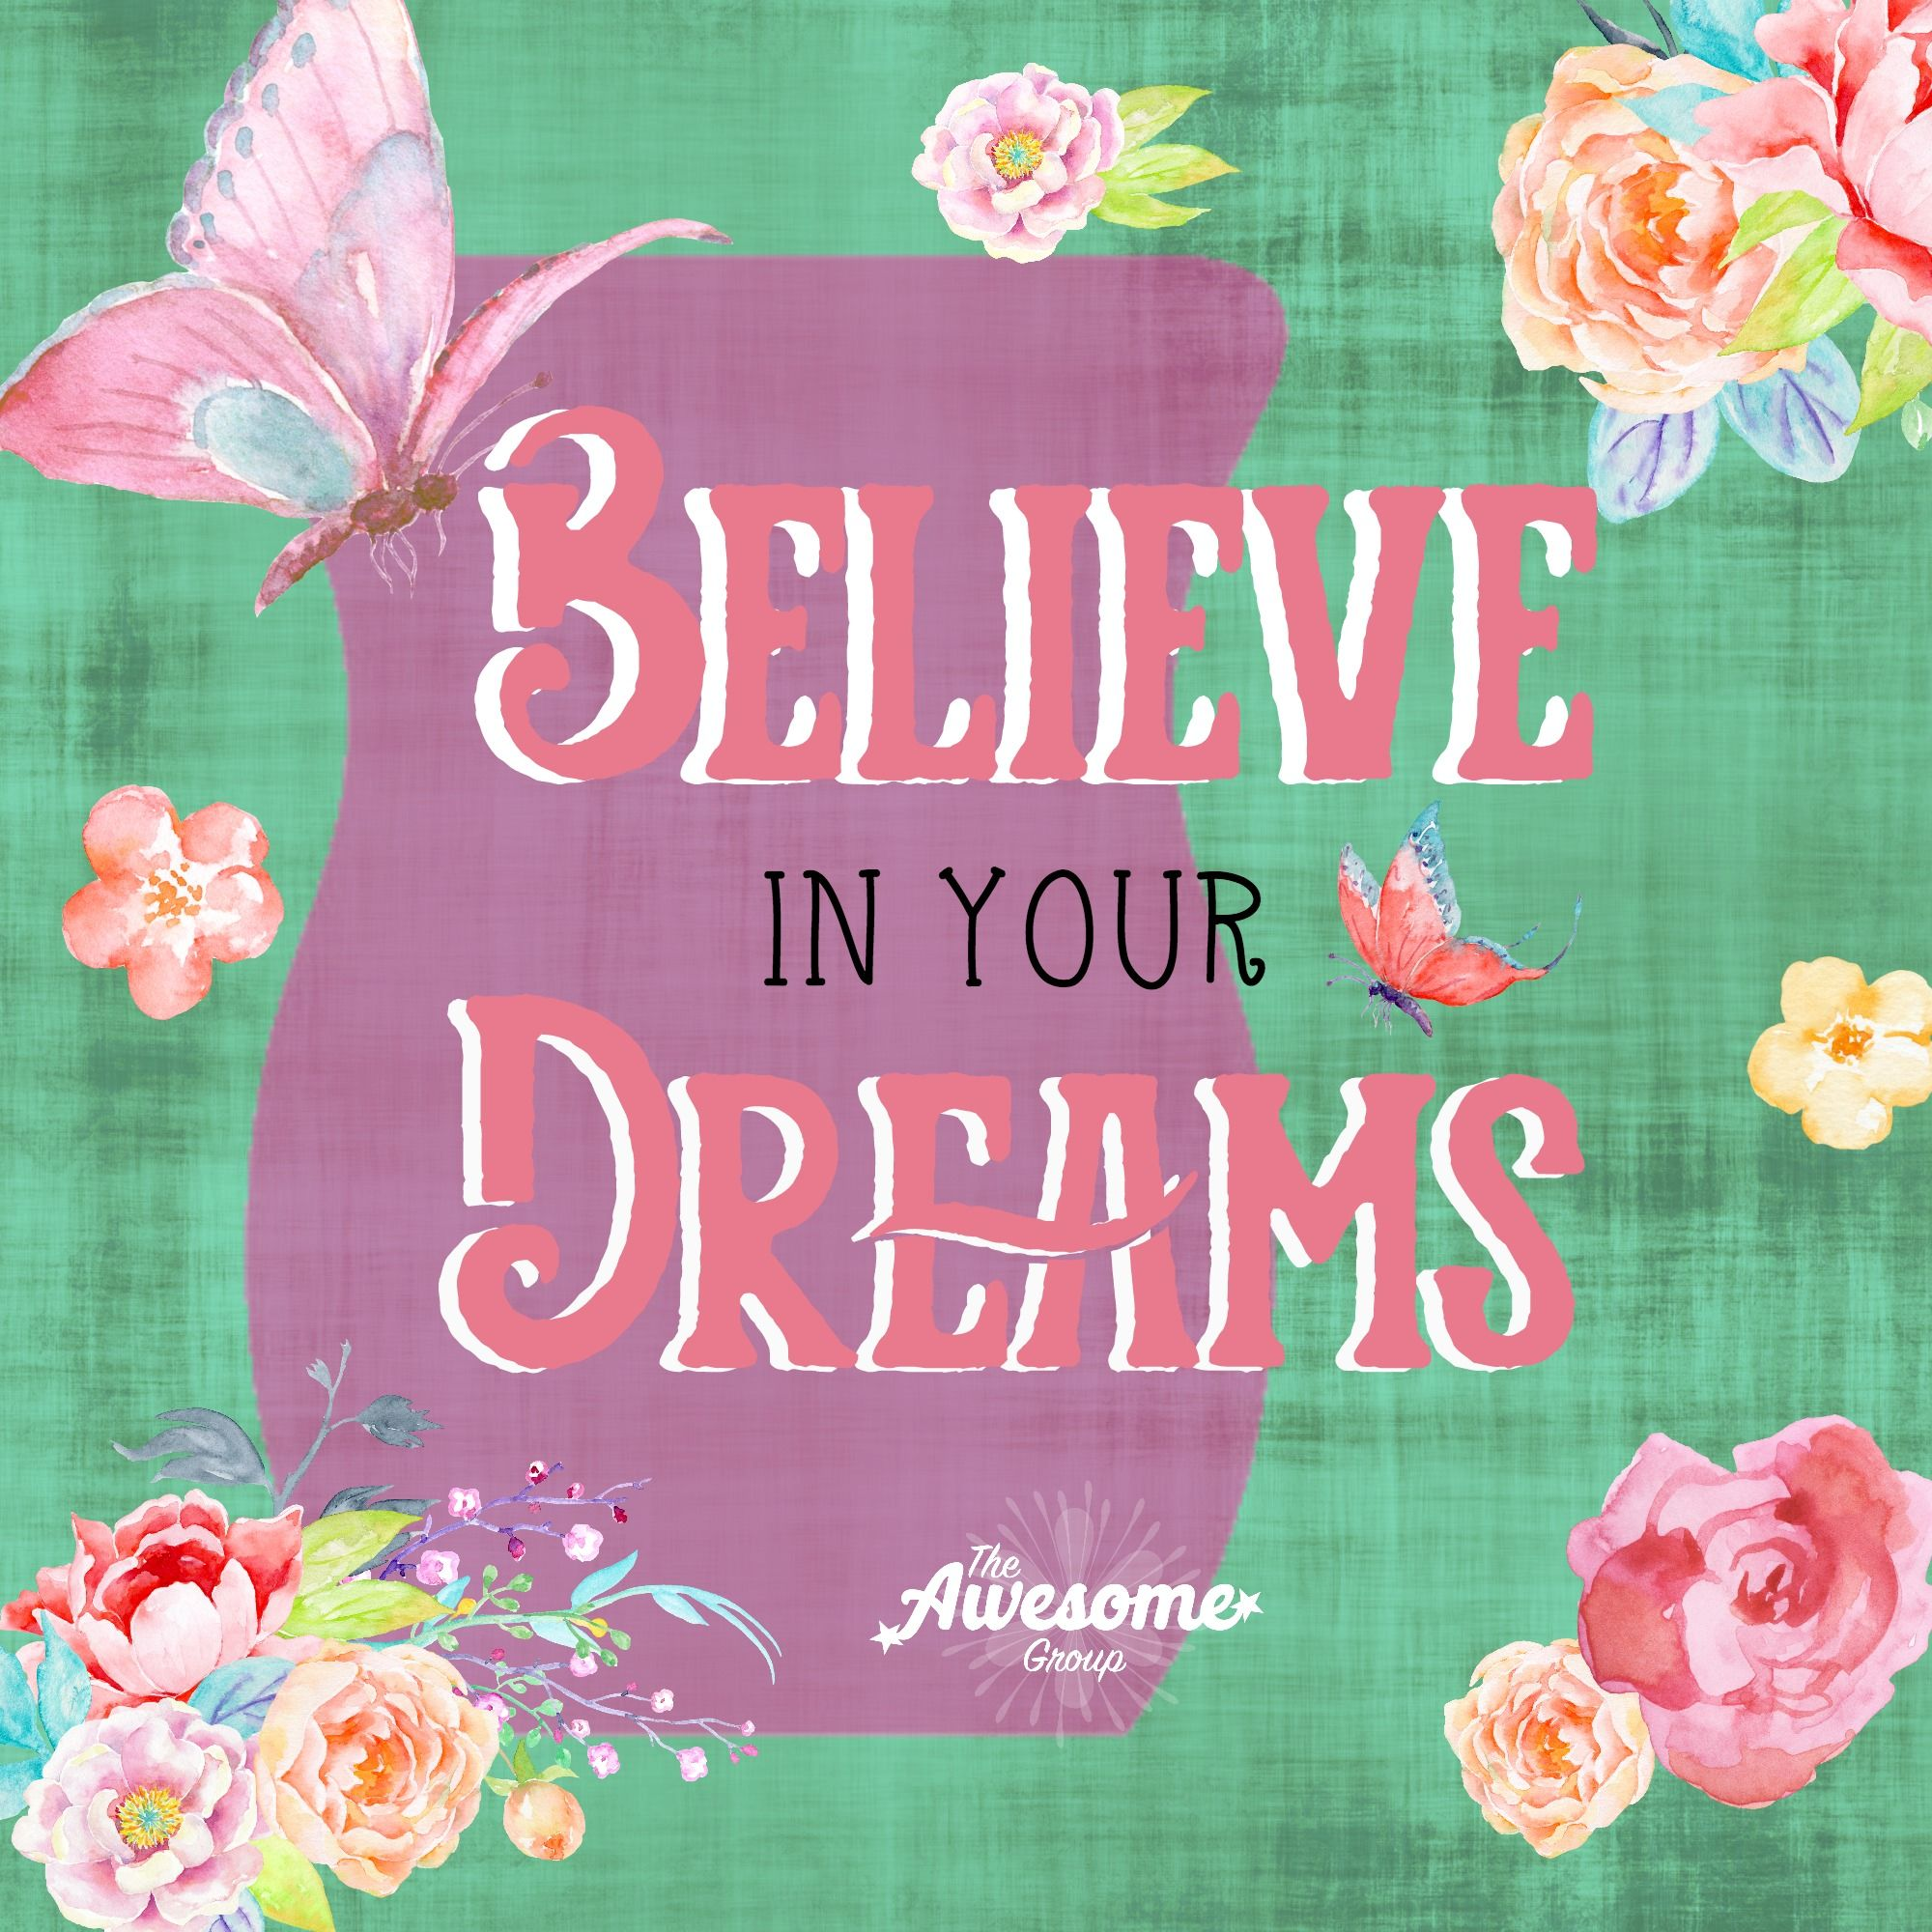 How Big Are Your Dreams Goals Dreams Serendipity Scentsy